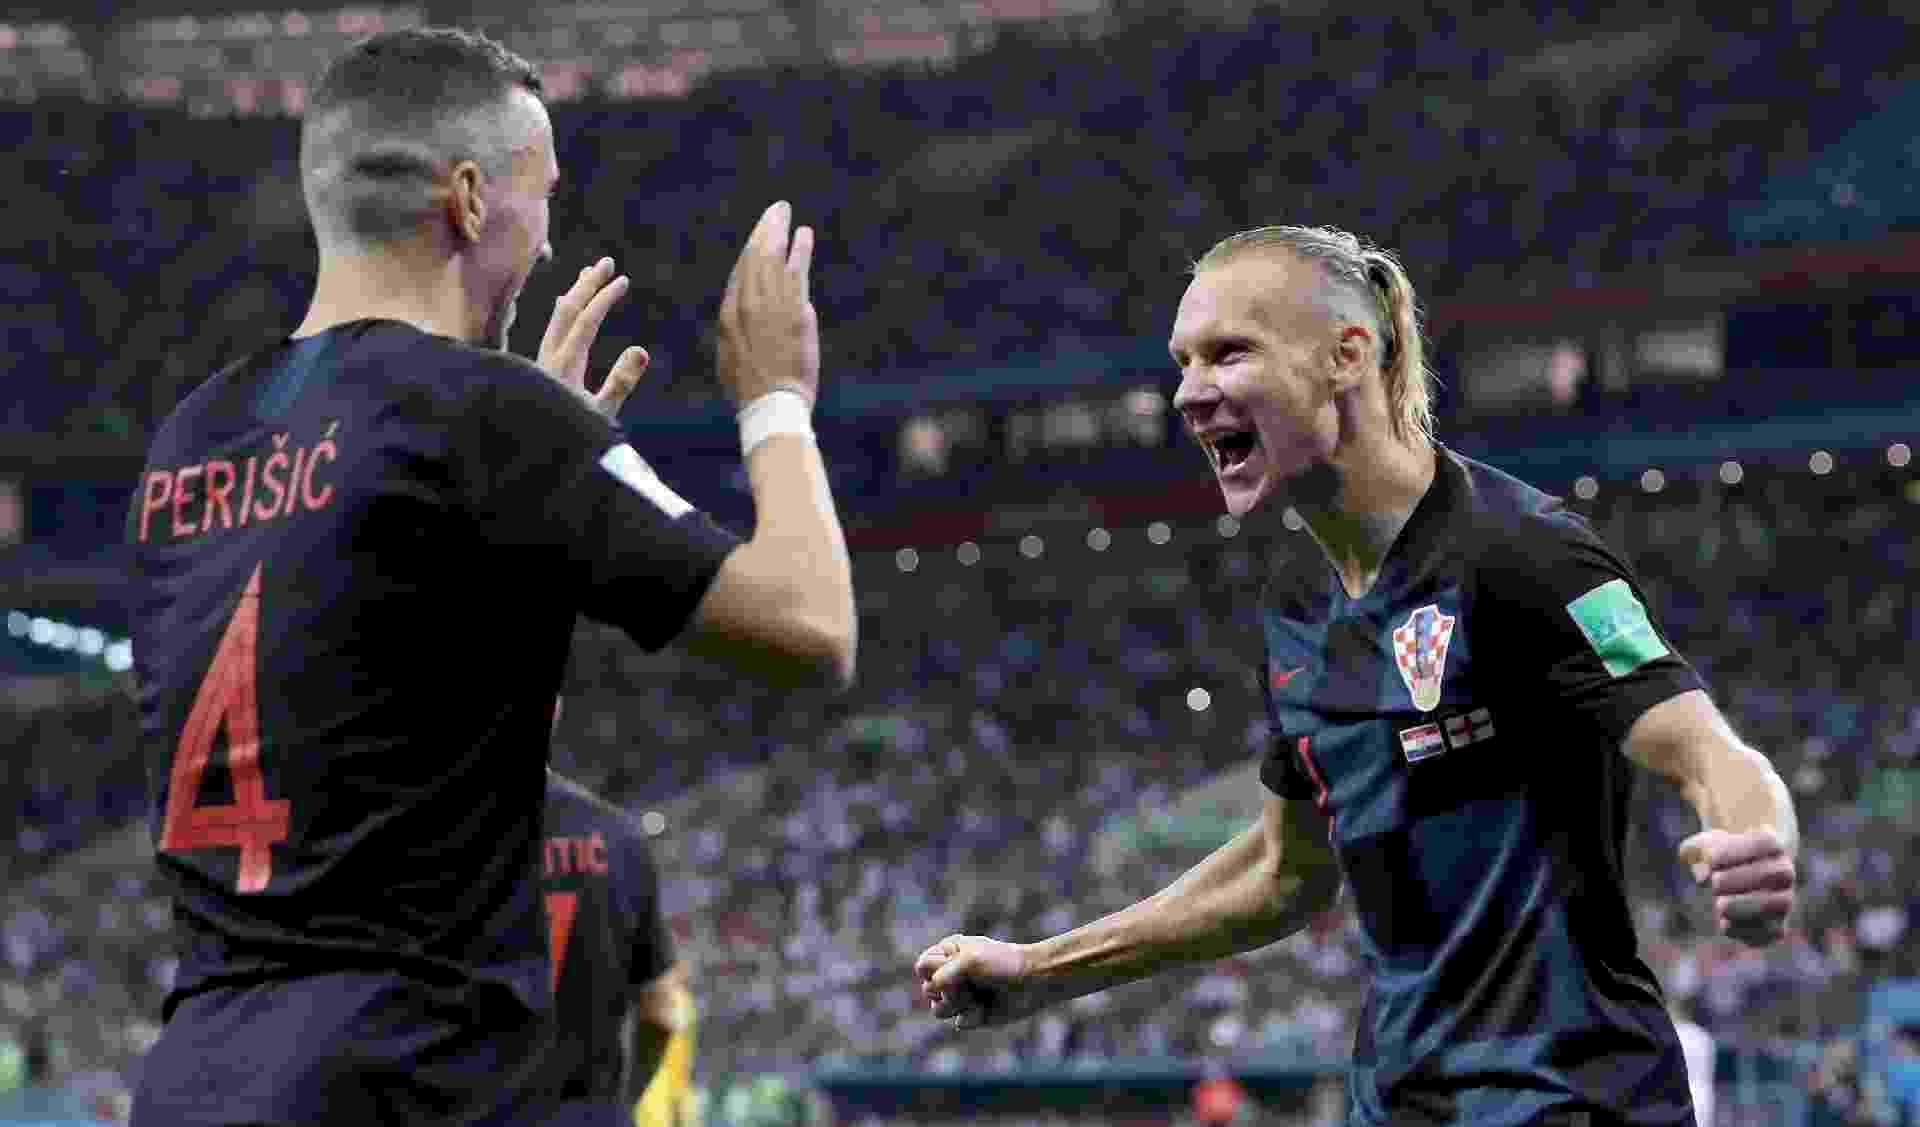 Ivan Perisic e Domagoj Vida, da Croácia, comemoram juntos gol de empate sobre a Inglaterra - Ryan Pierse/Getty Images